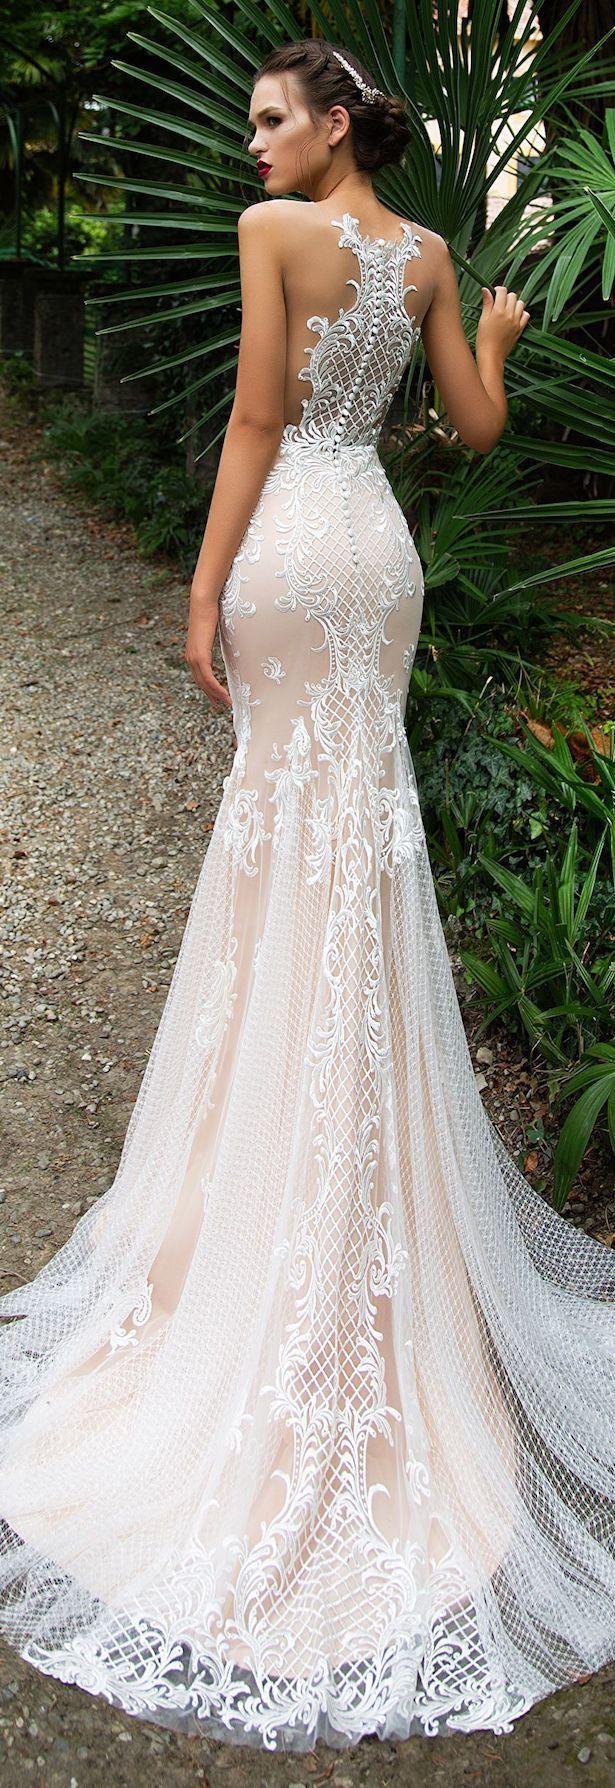 White lace bodycon wedding dress nordstrom